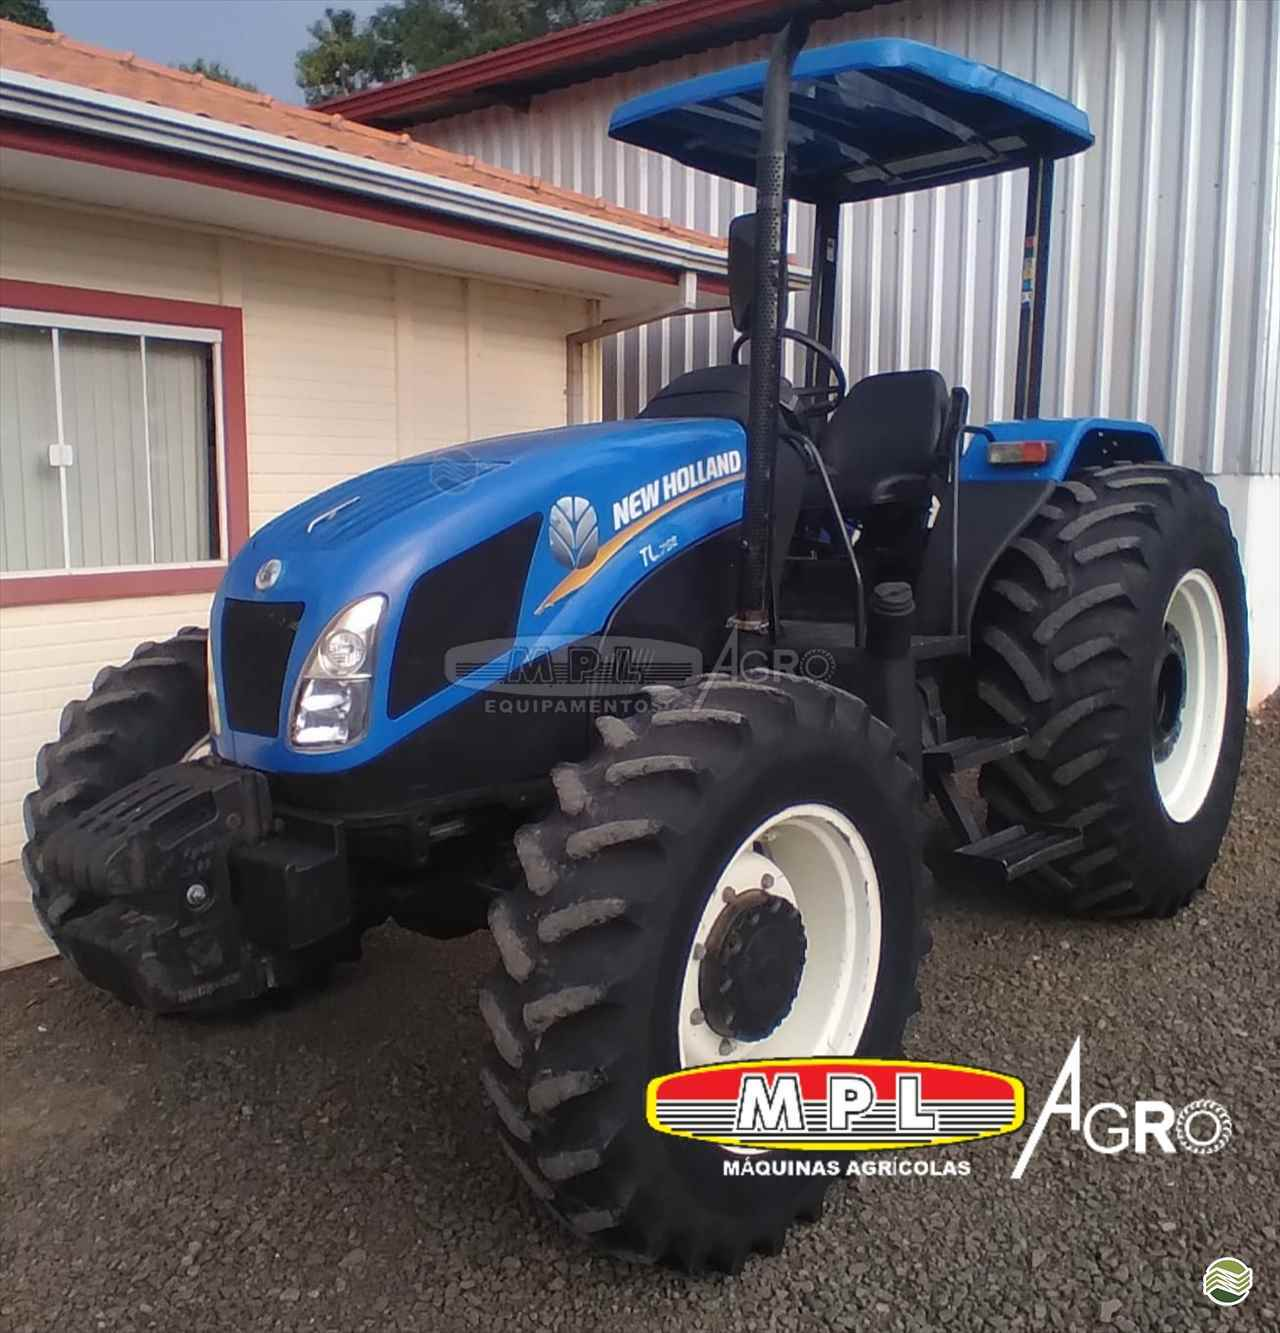 NEW TL 75 de MPL Agro - Máquinas Agrícolas - IRATI/PR